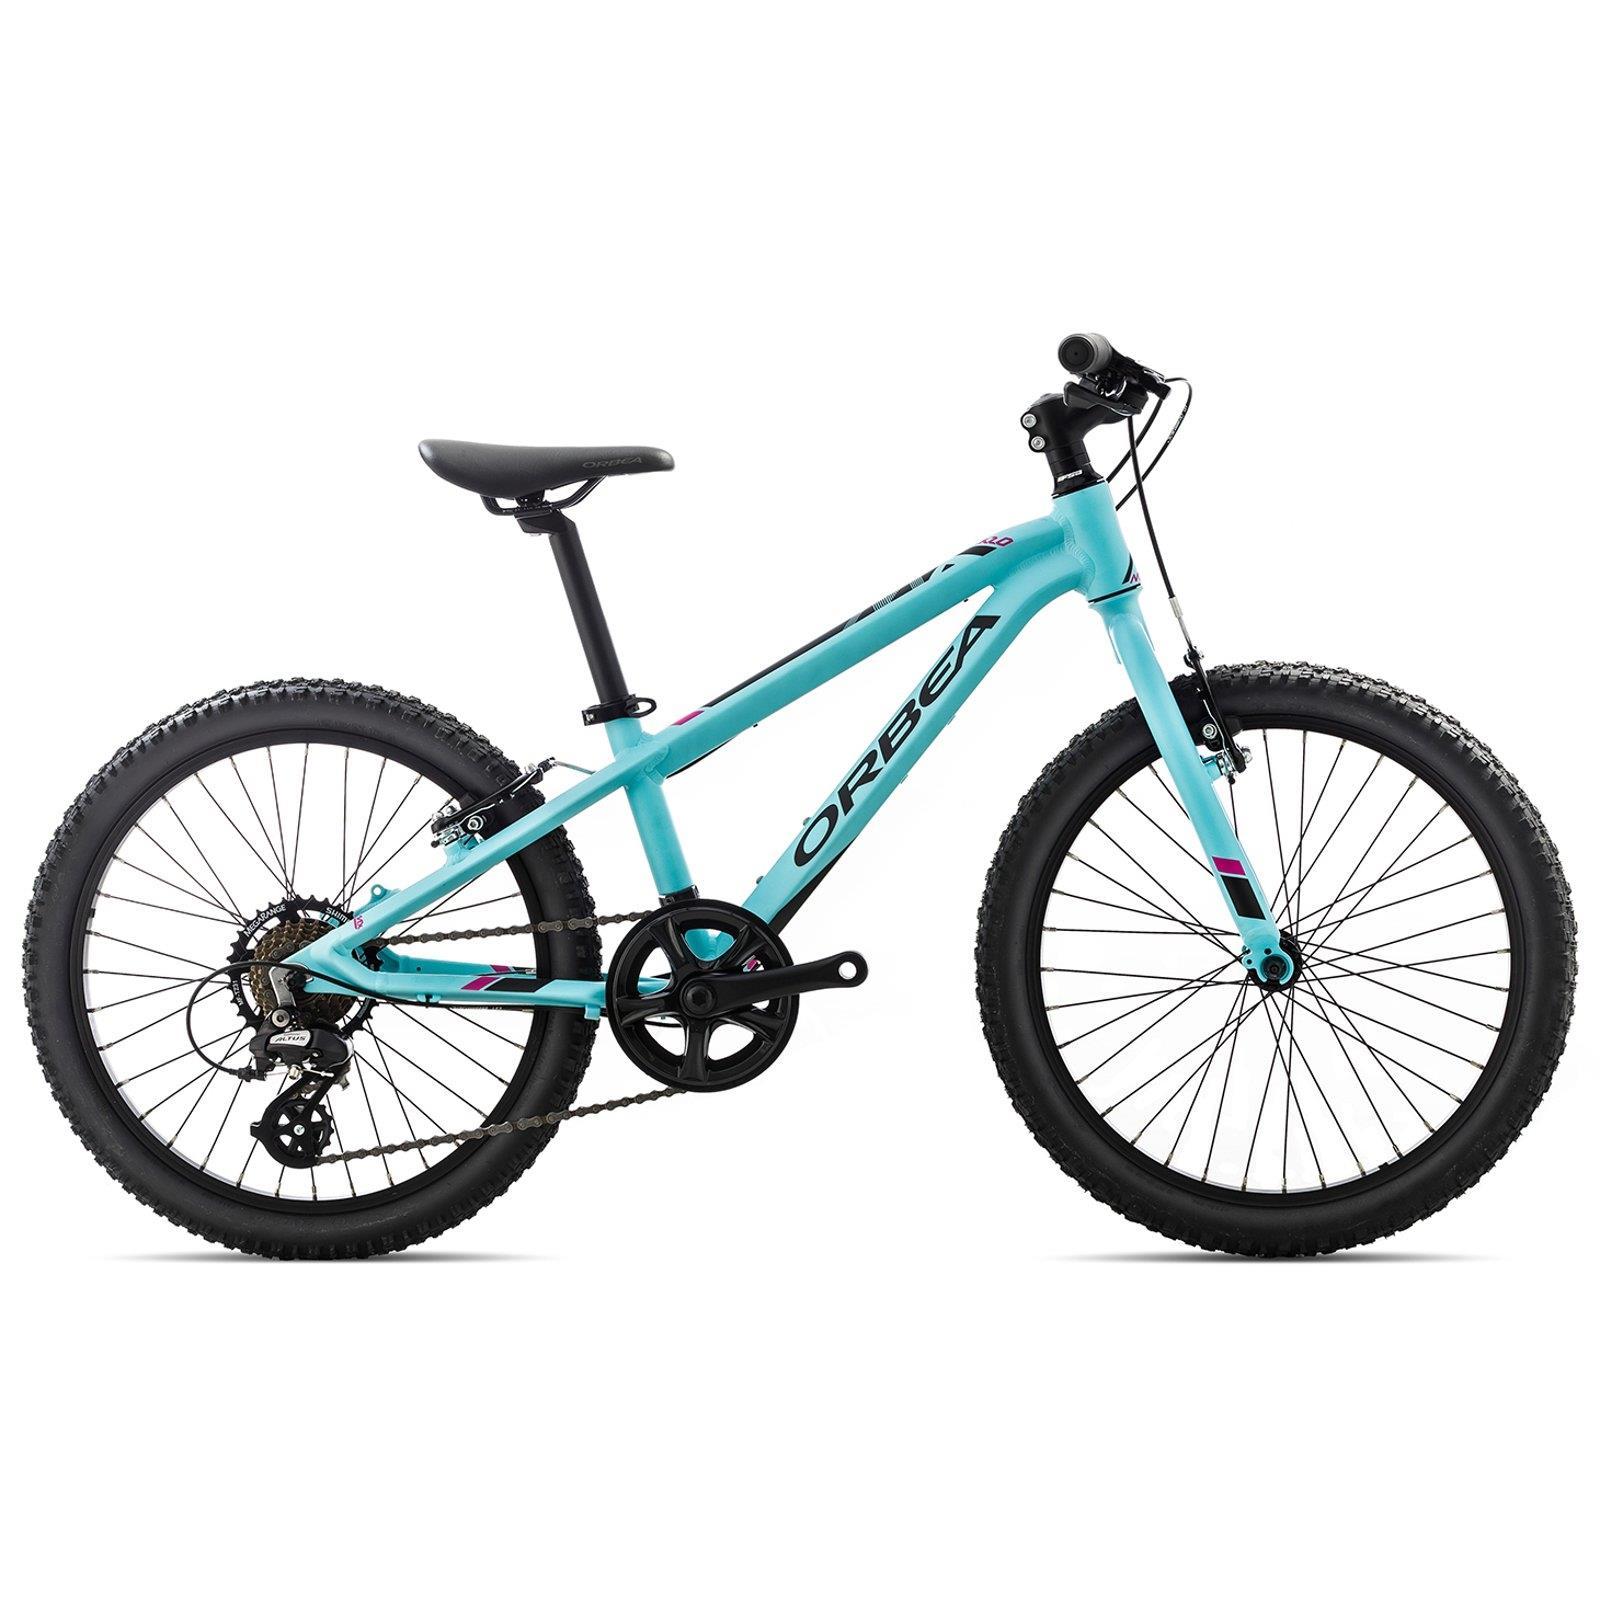 orbea mx 20 dirt kinder fahrrad 20 zoll 7 gang mtb rad. Black Bedroom Furniture Sets. Home Design Ideas